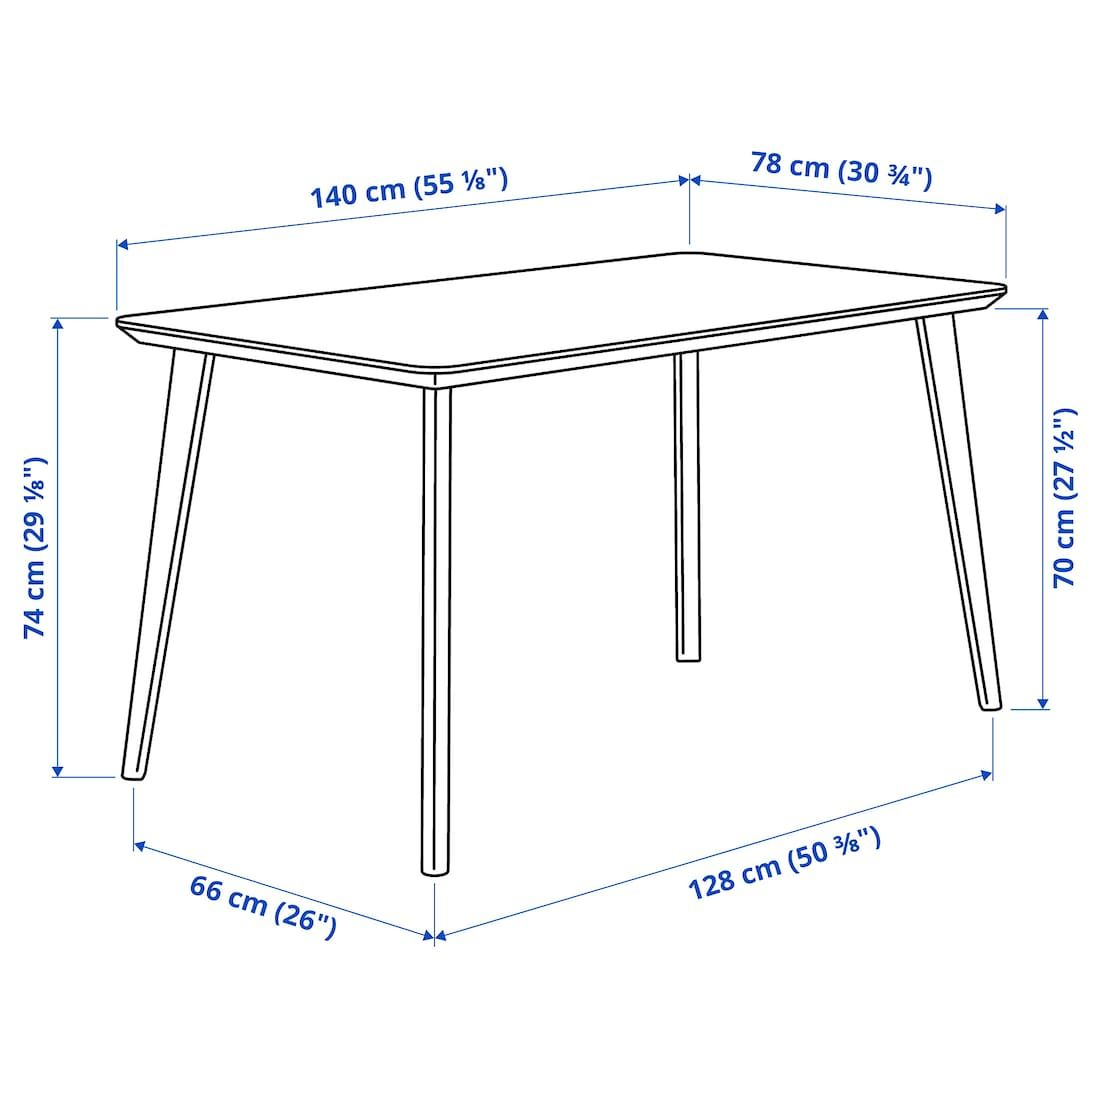 Lisabo Table Ash Veneer Ikea Ikea Wood Slats Cleaning Clothes [ 1100 x 1100 Pixel ]